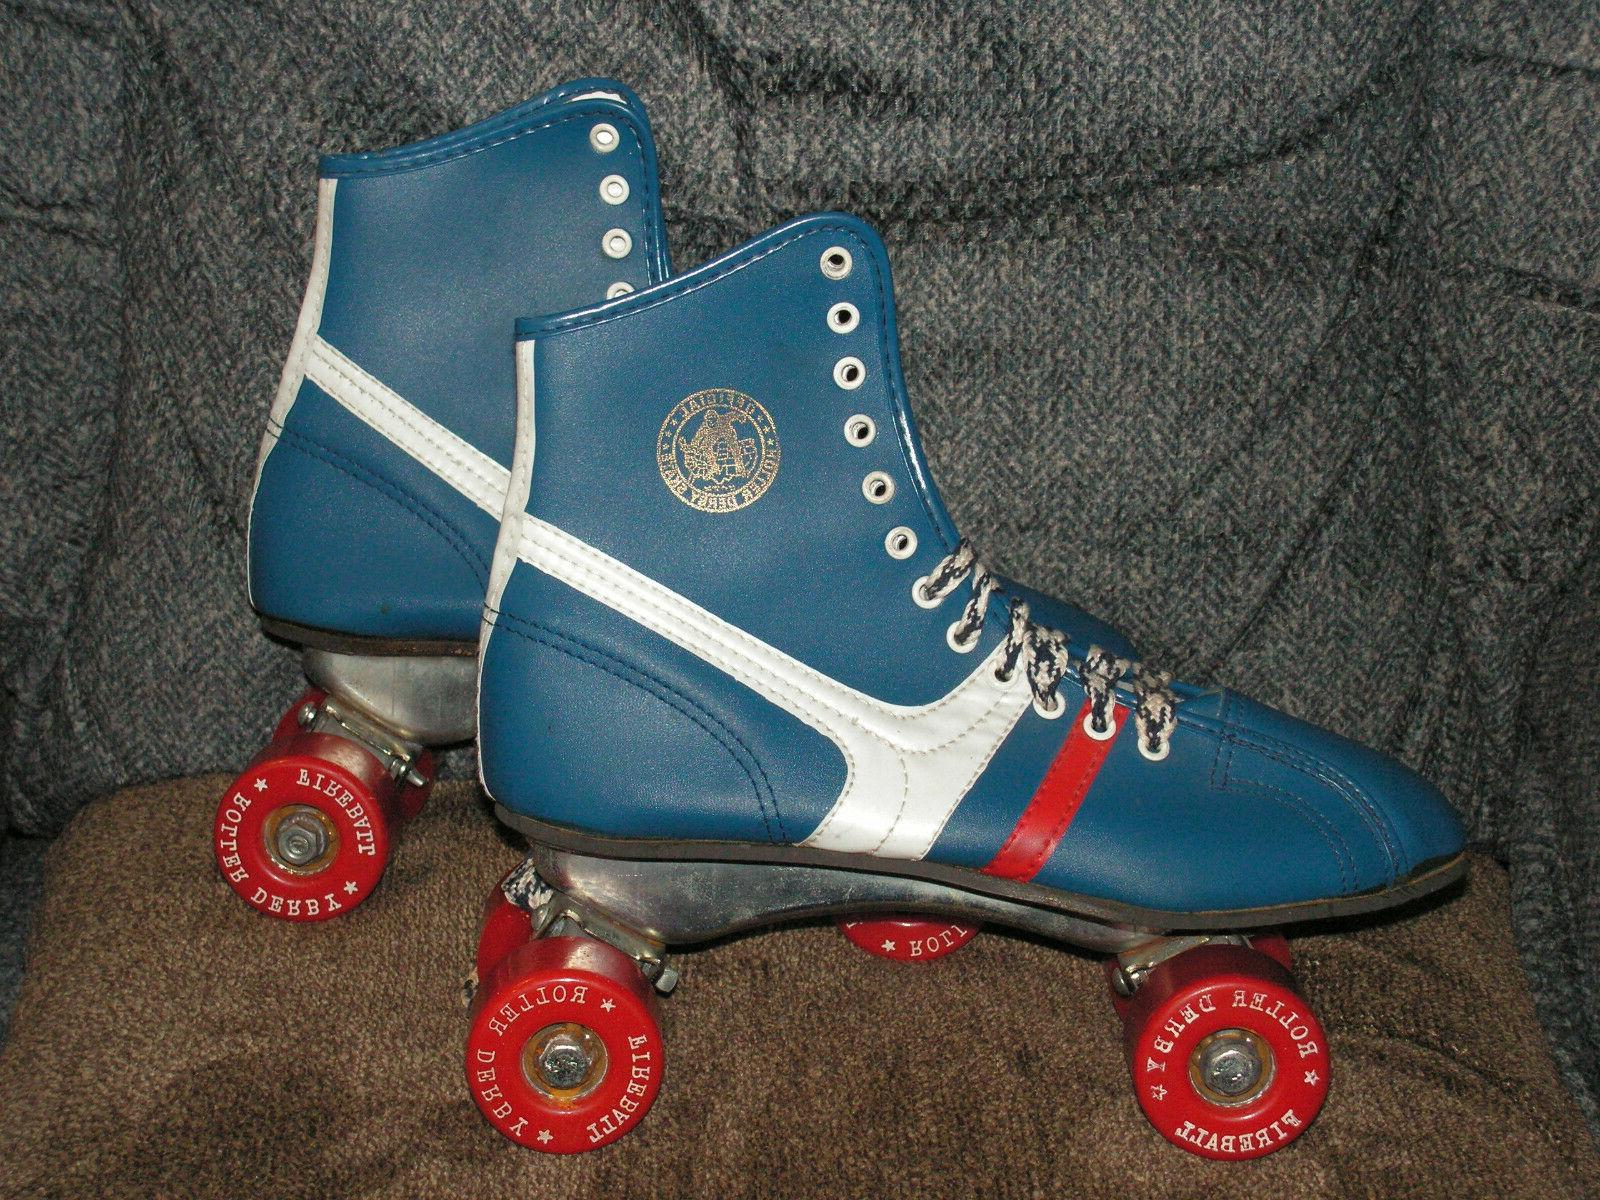 vintage 70s fireball roller skates blue red